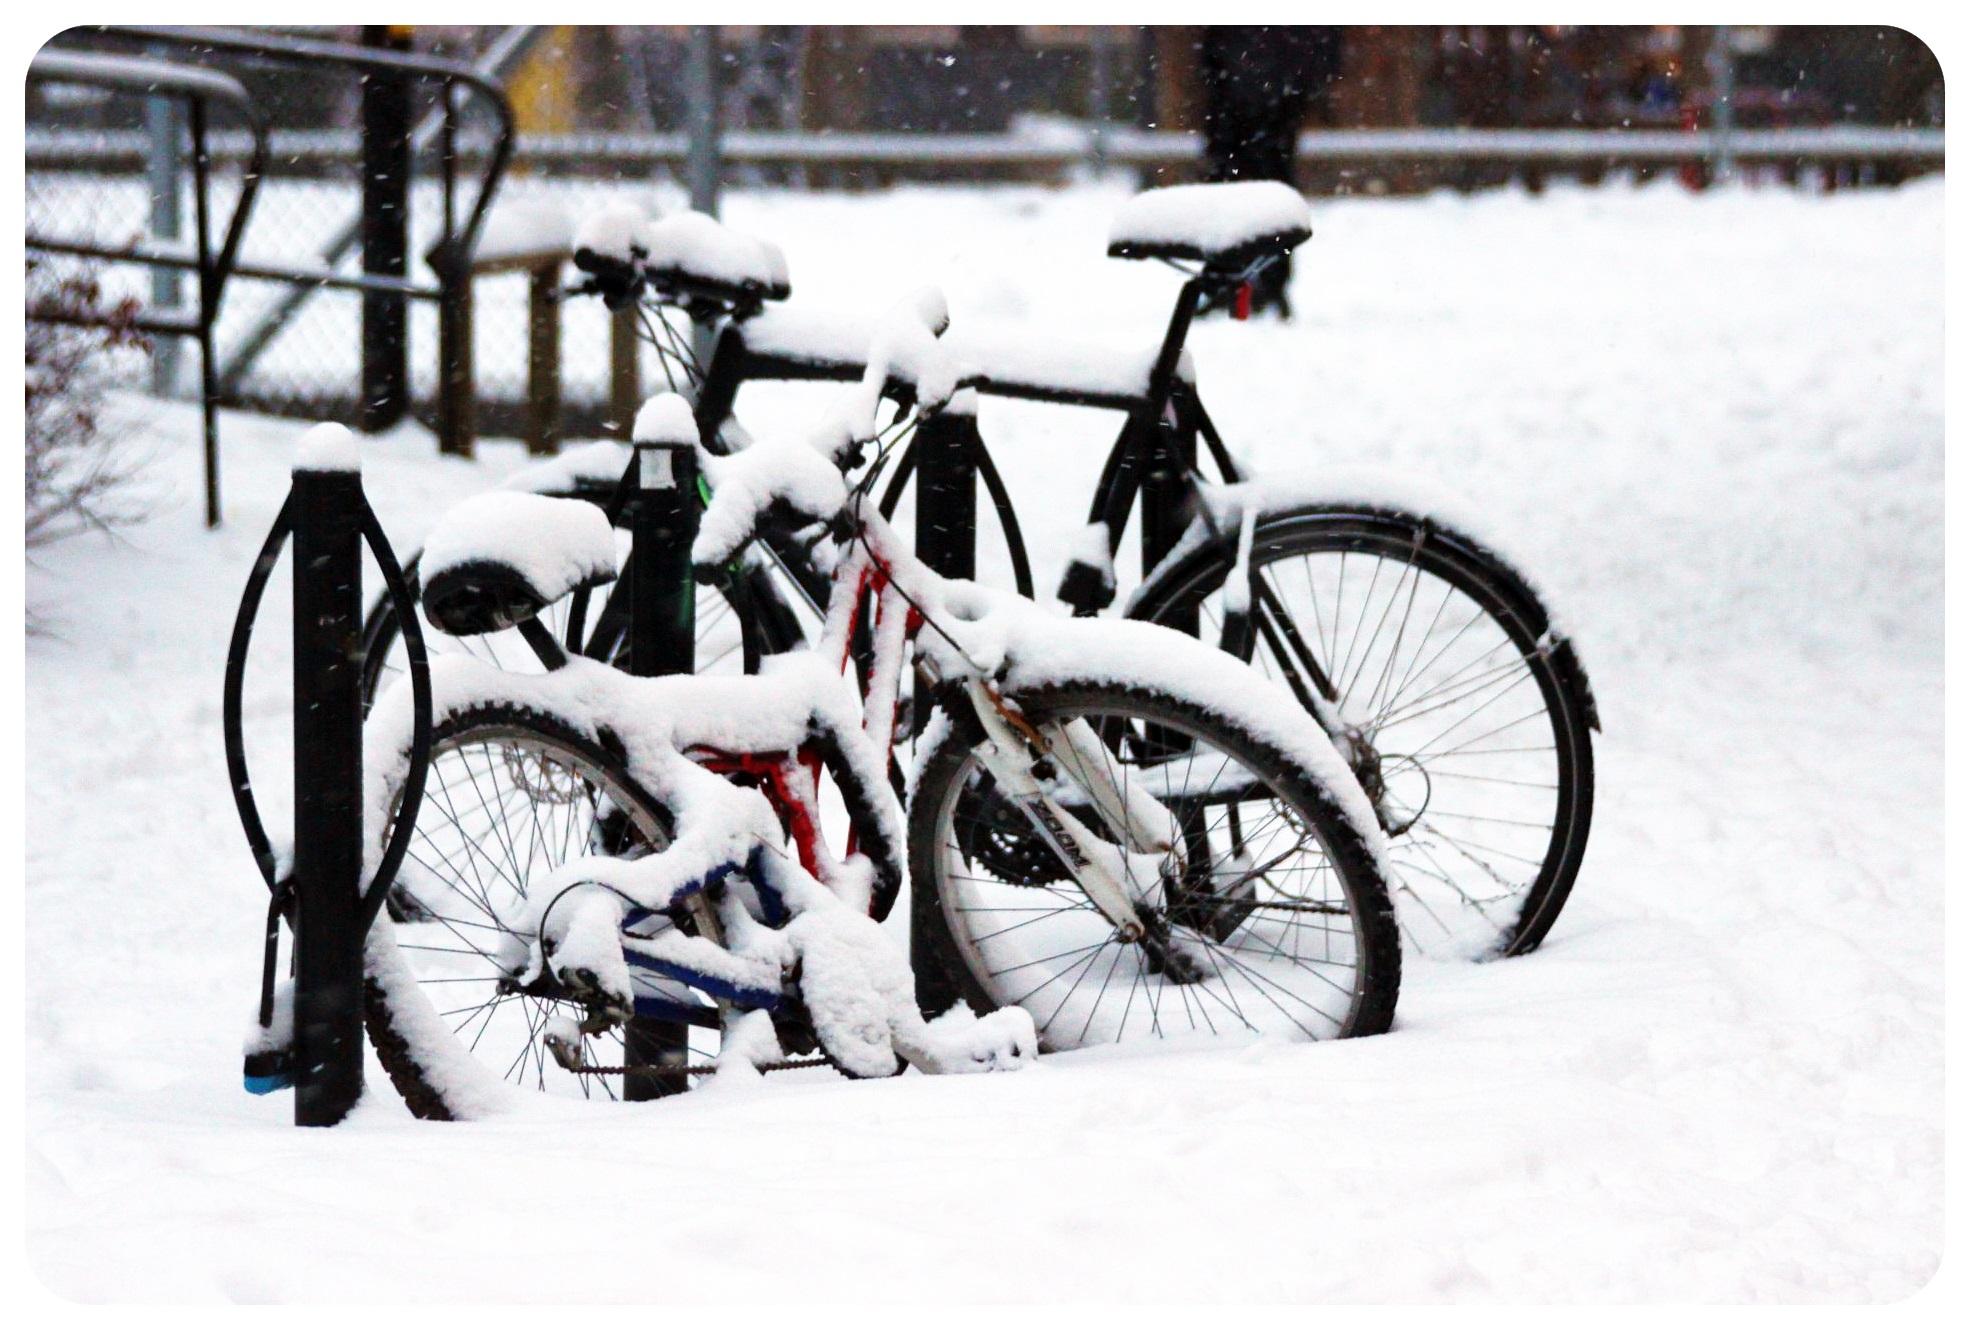 snow bikes stockholm sweden